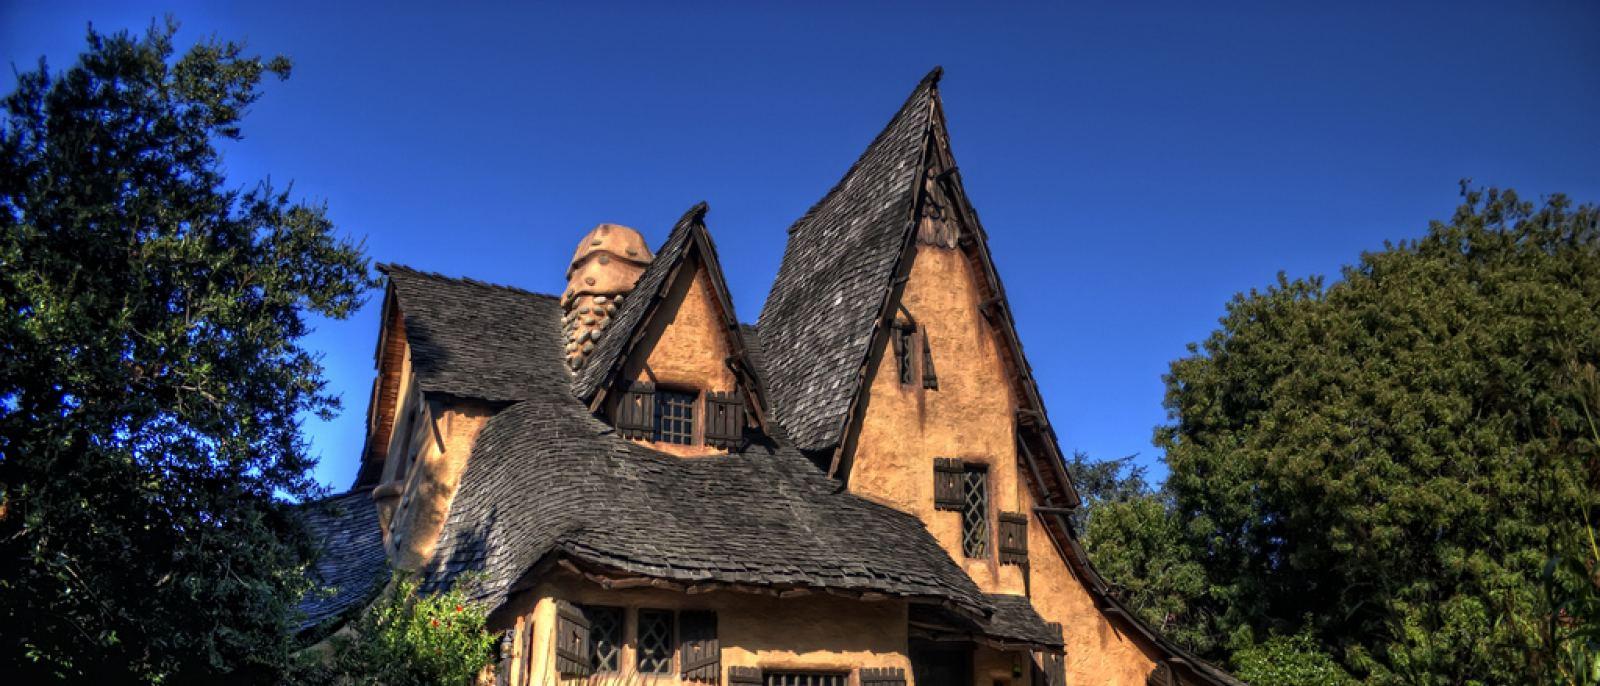 Spadena House Witch's House